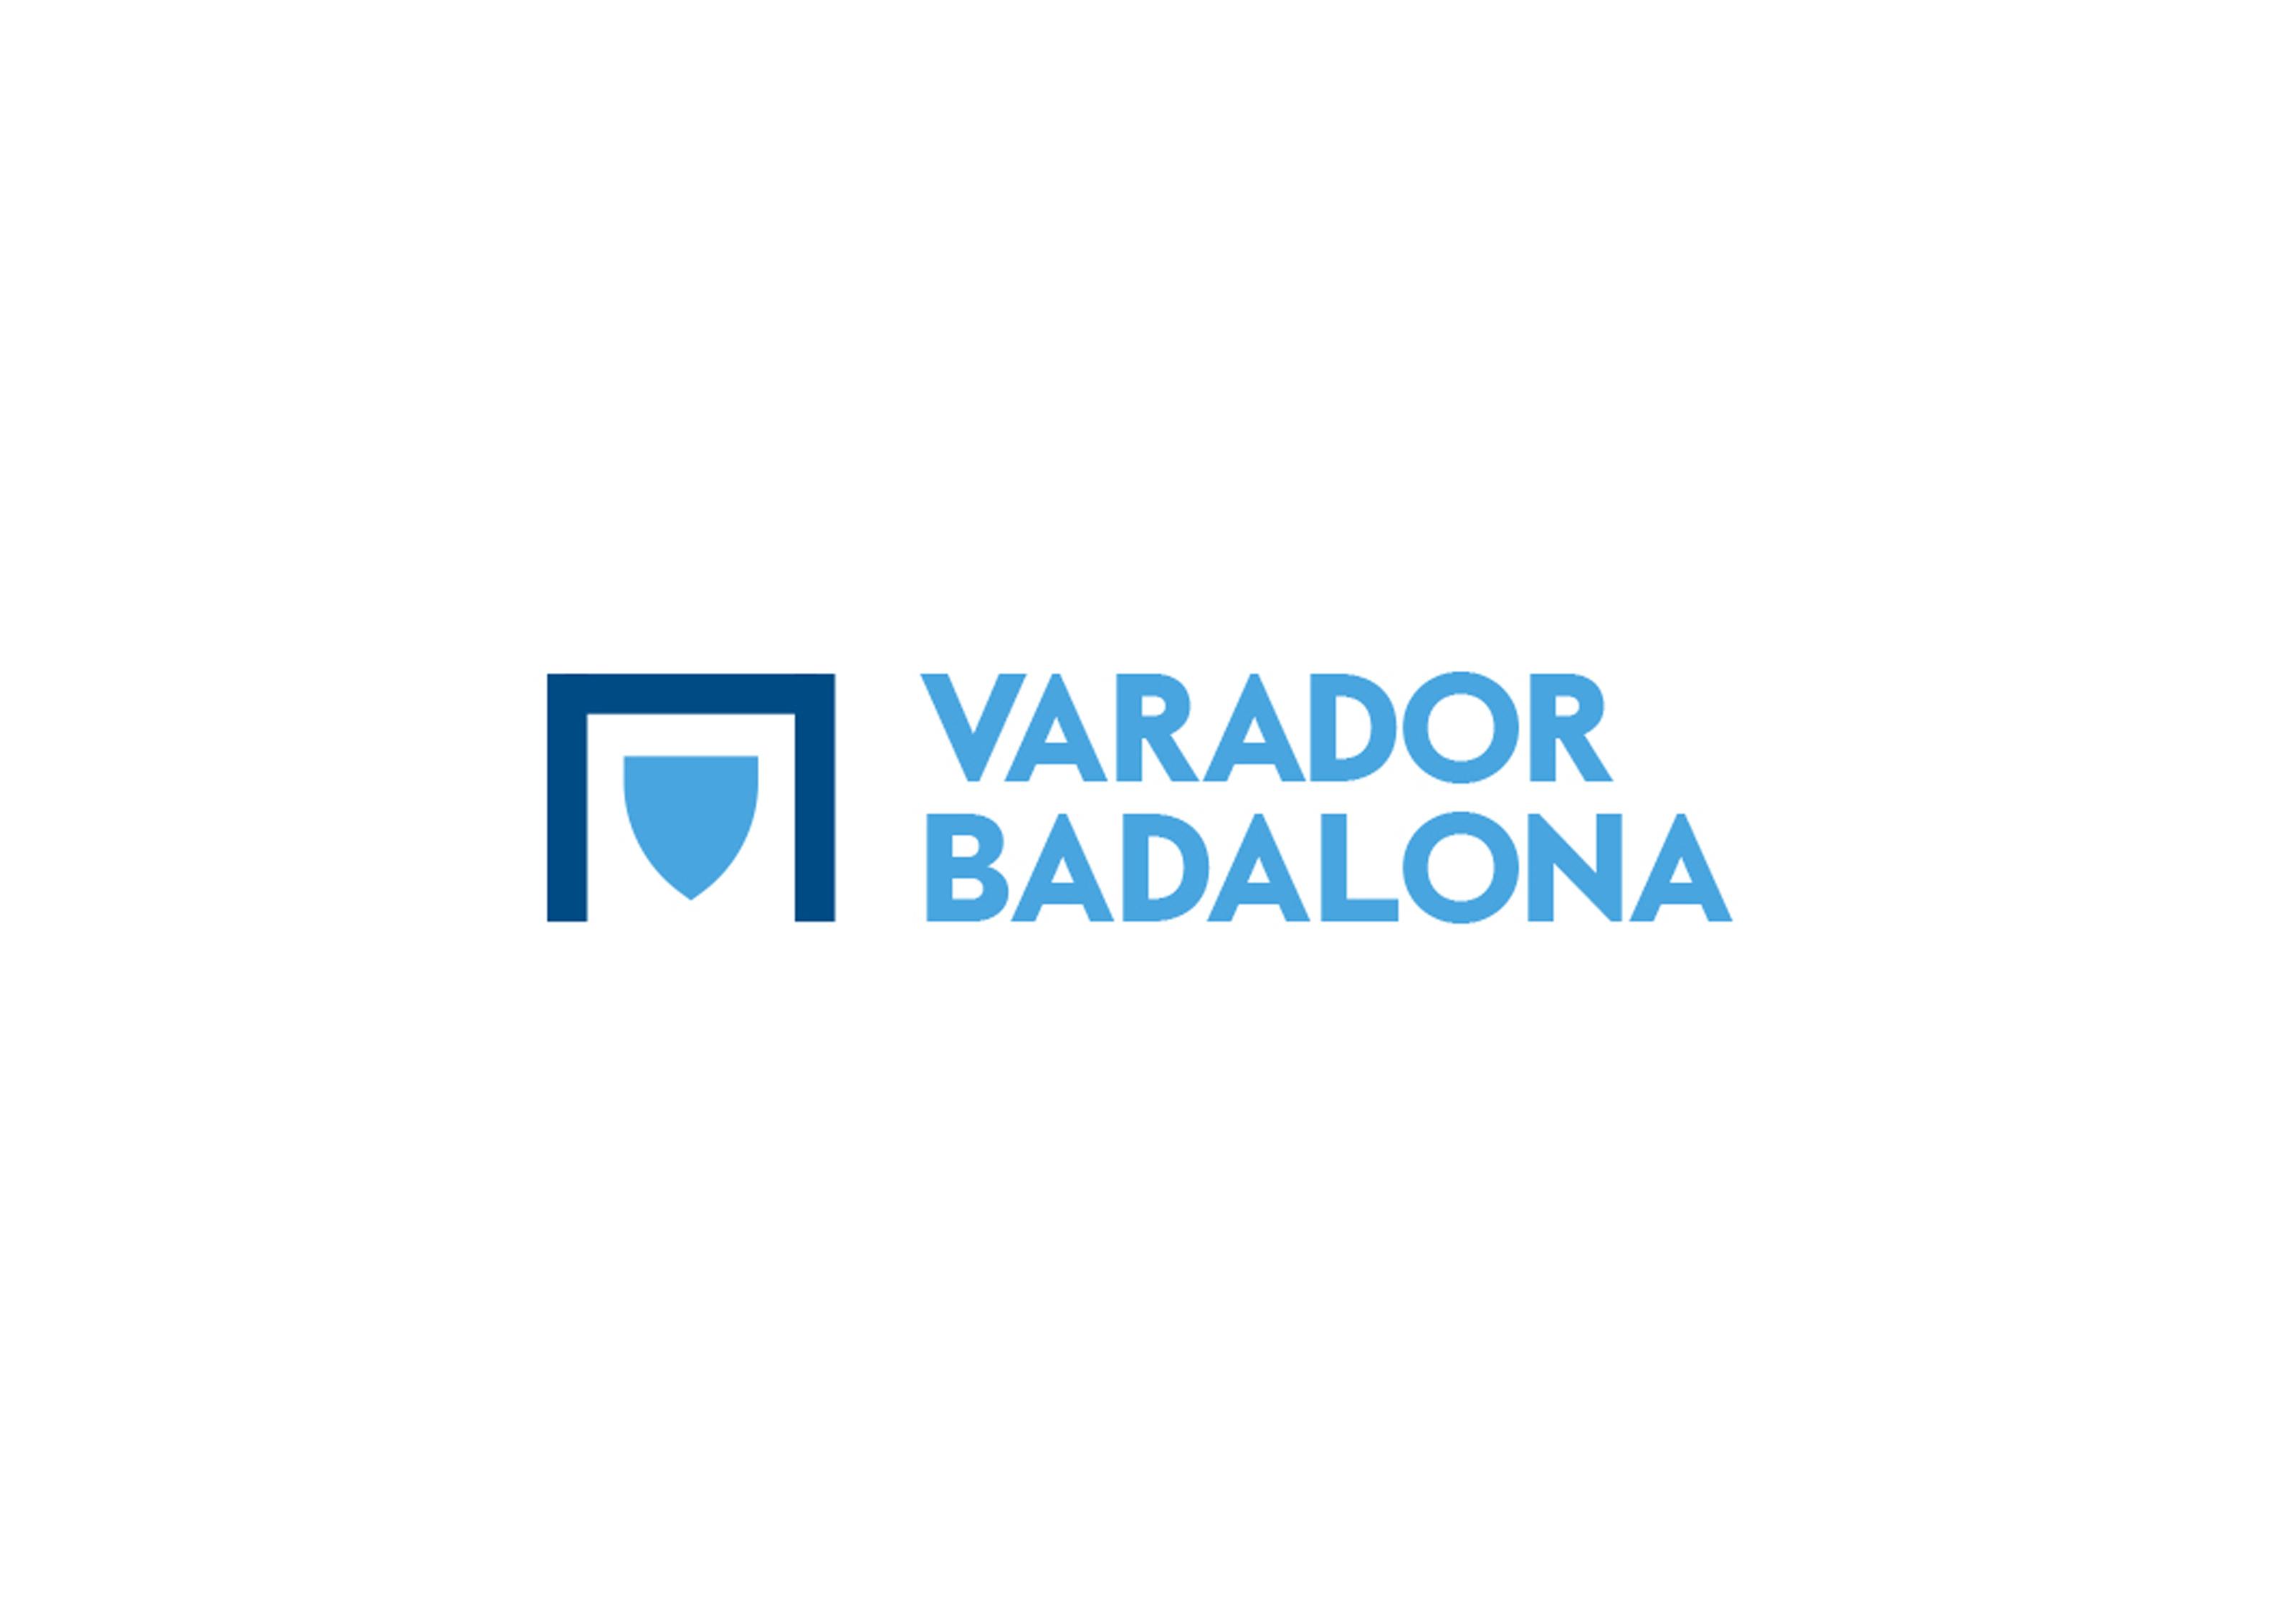 Varador_badalona_4.jpg